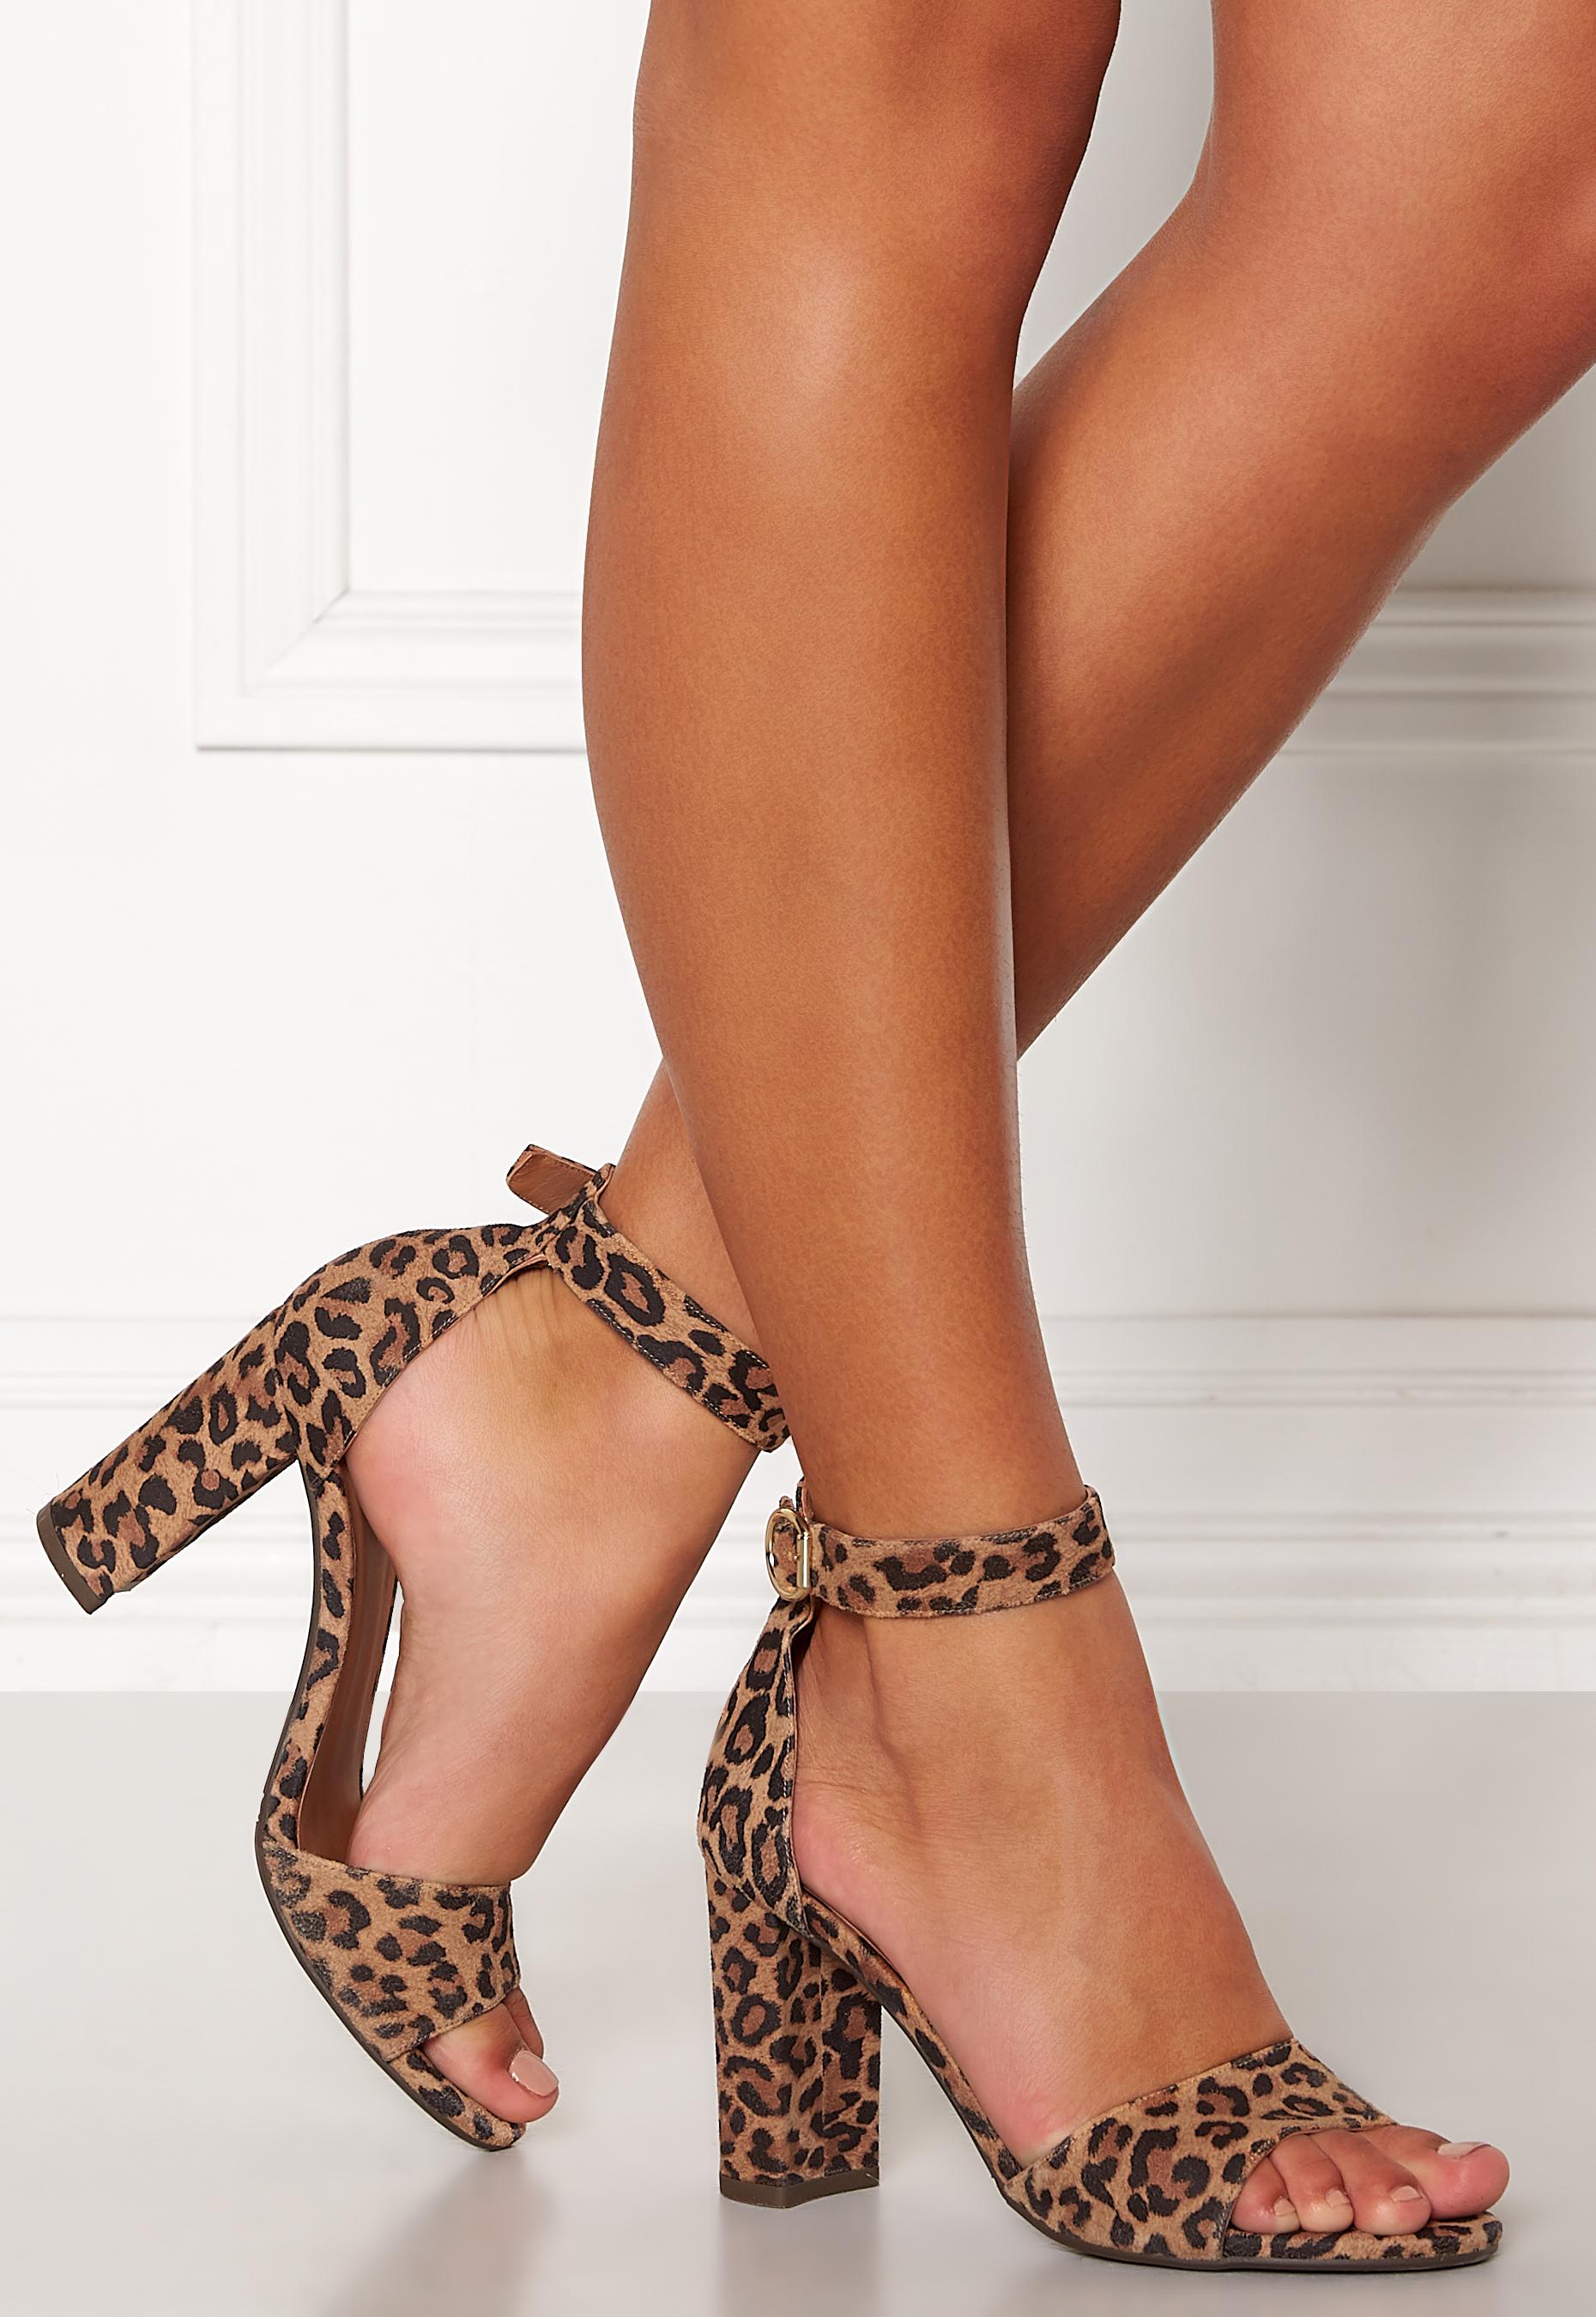 64162dedb4e4 Billi Bi Leopard Suede Sandals Leopard - Bubbleroom